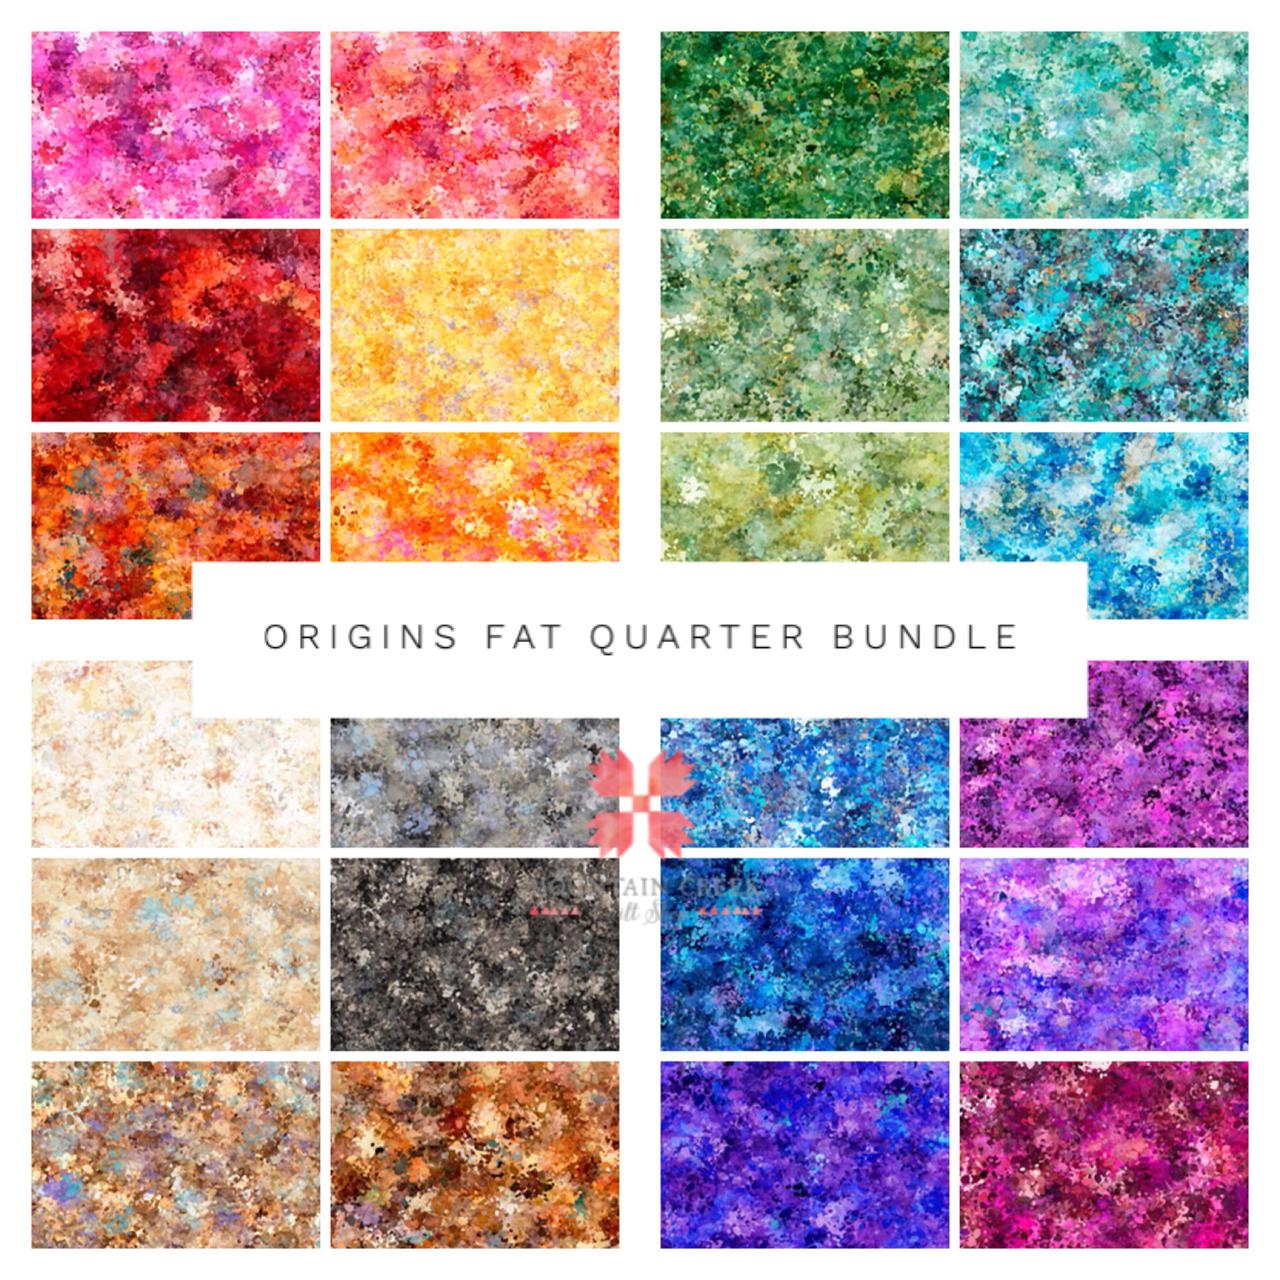 Origins Fat Quarter Bundle